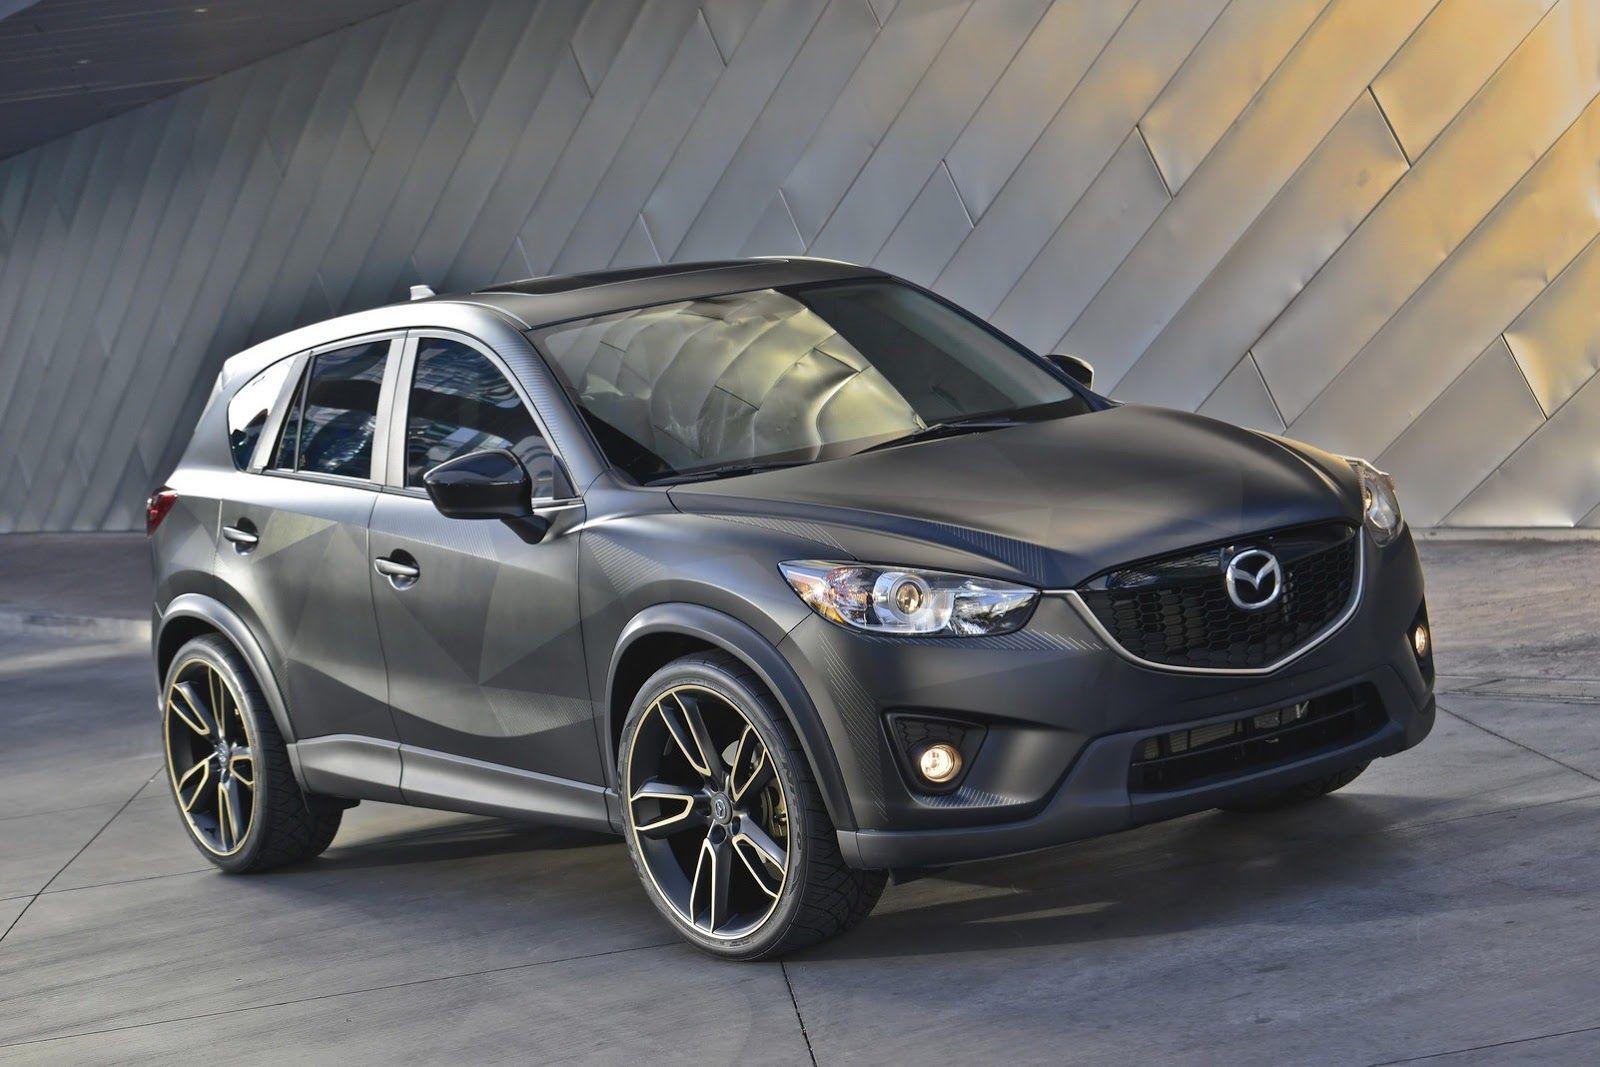 Mazda cx5 custom wheels google search reinvent the wheel pinterest mazda cx5 custom wheels and mazda